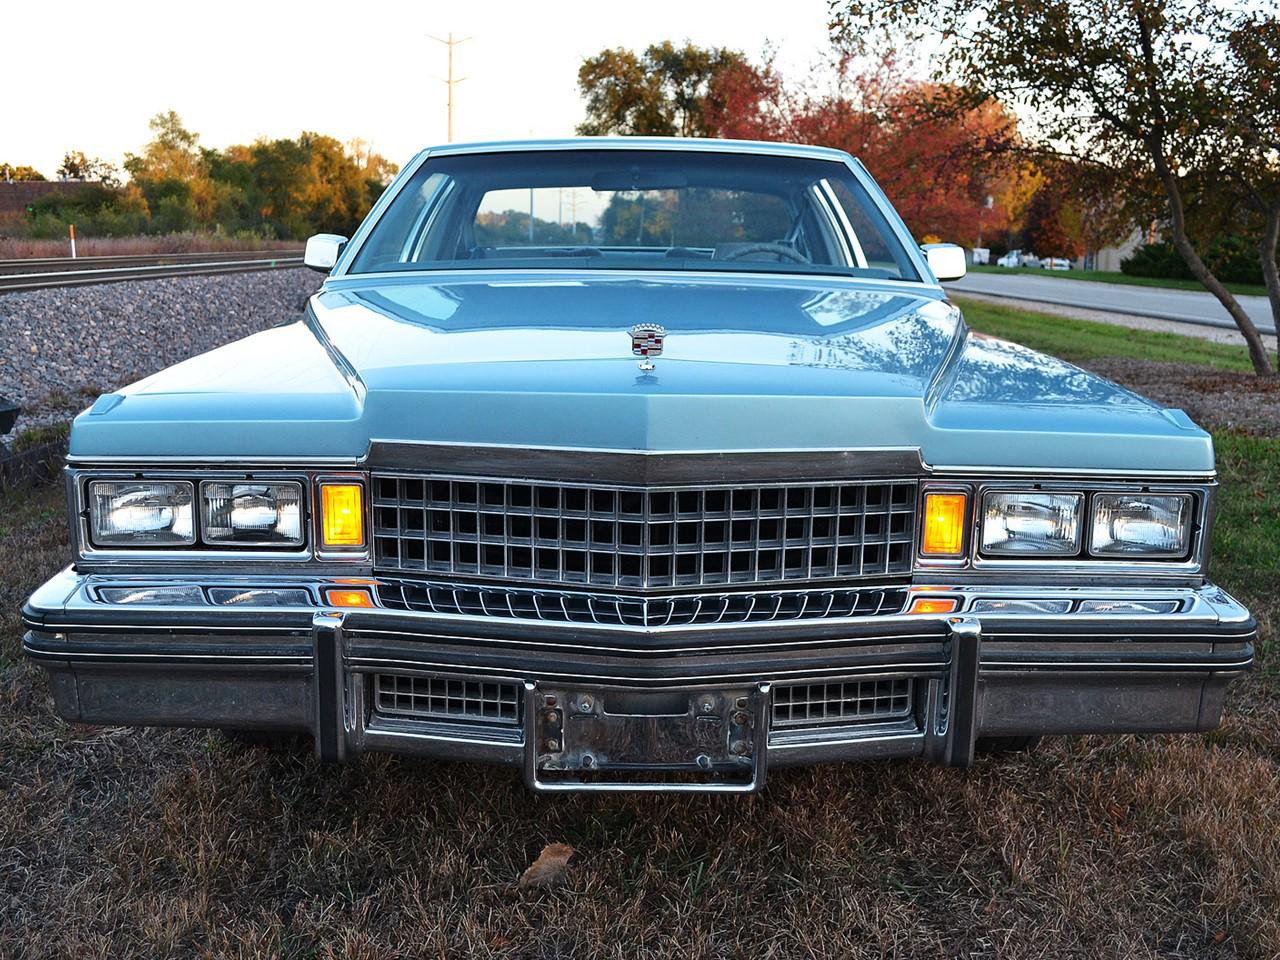 1978 Cadillac DeVille Coupe d'Elegance | NotoriousLuxury